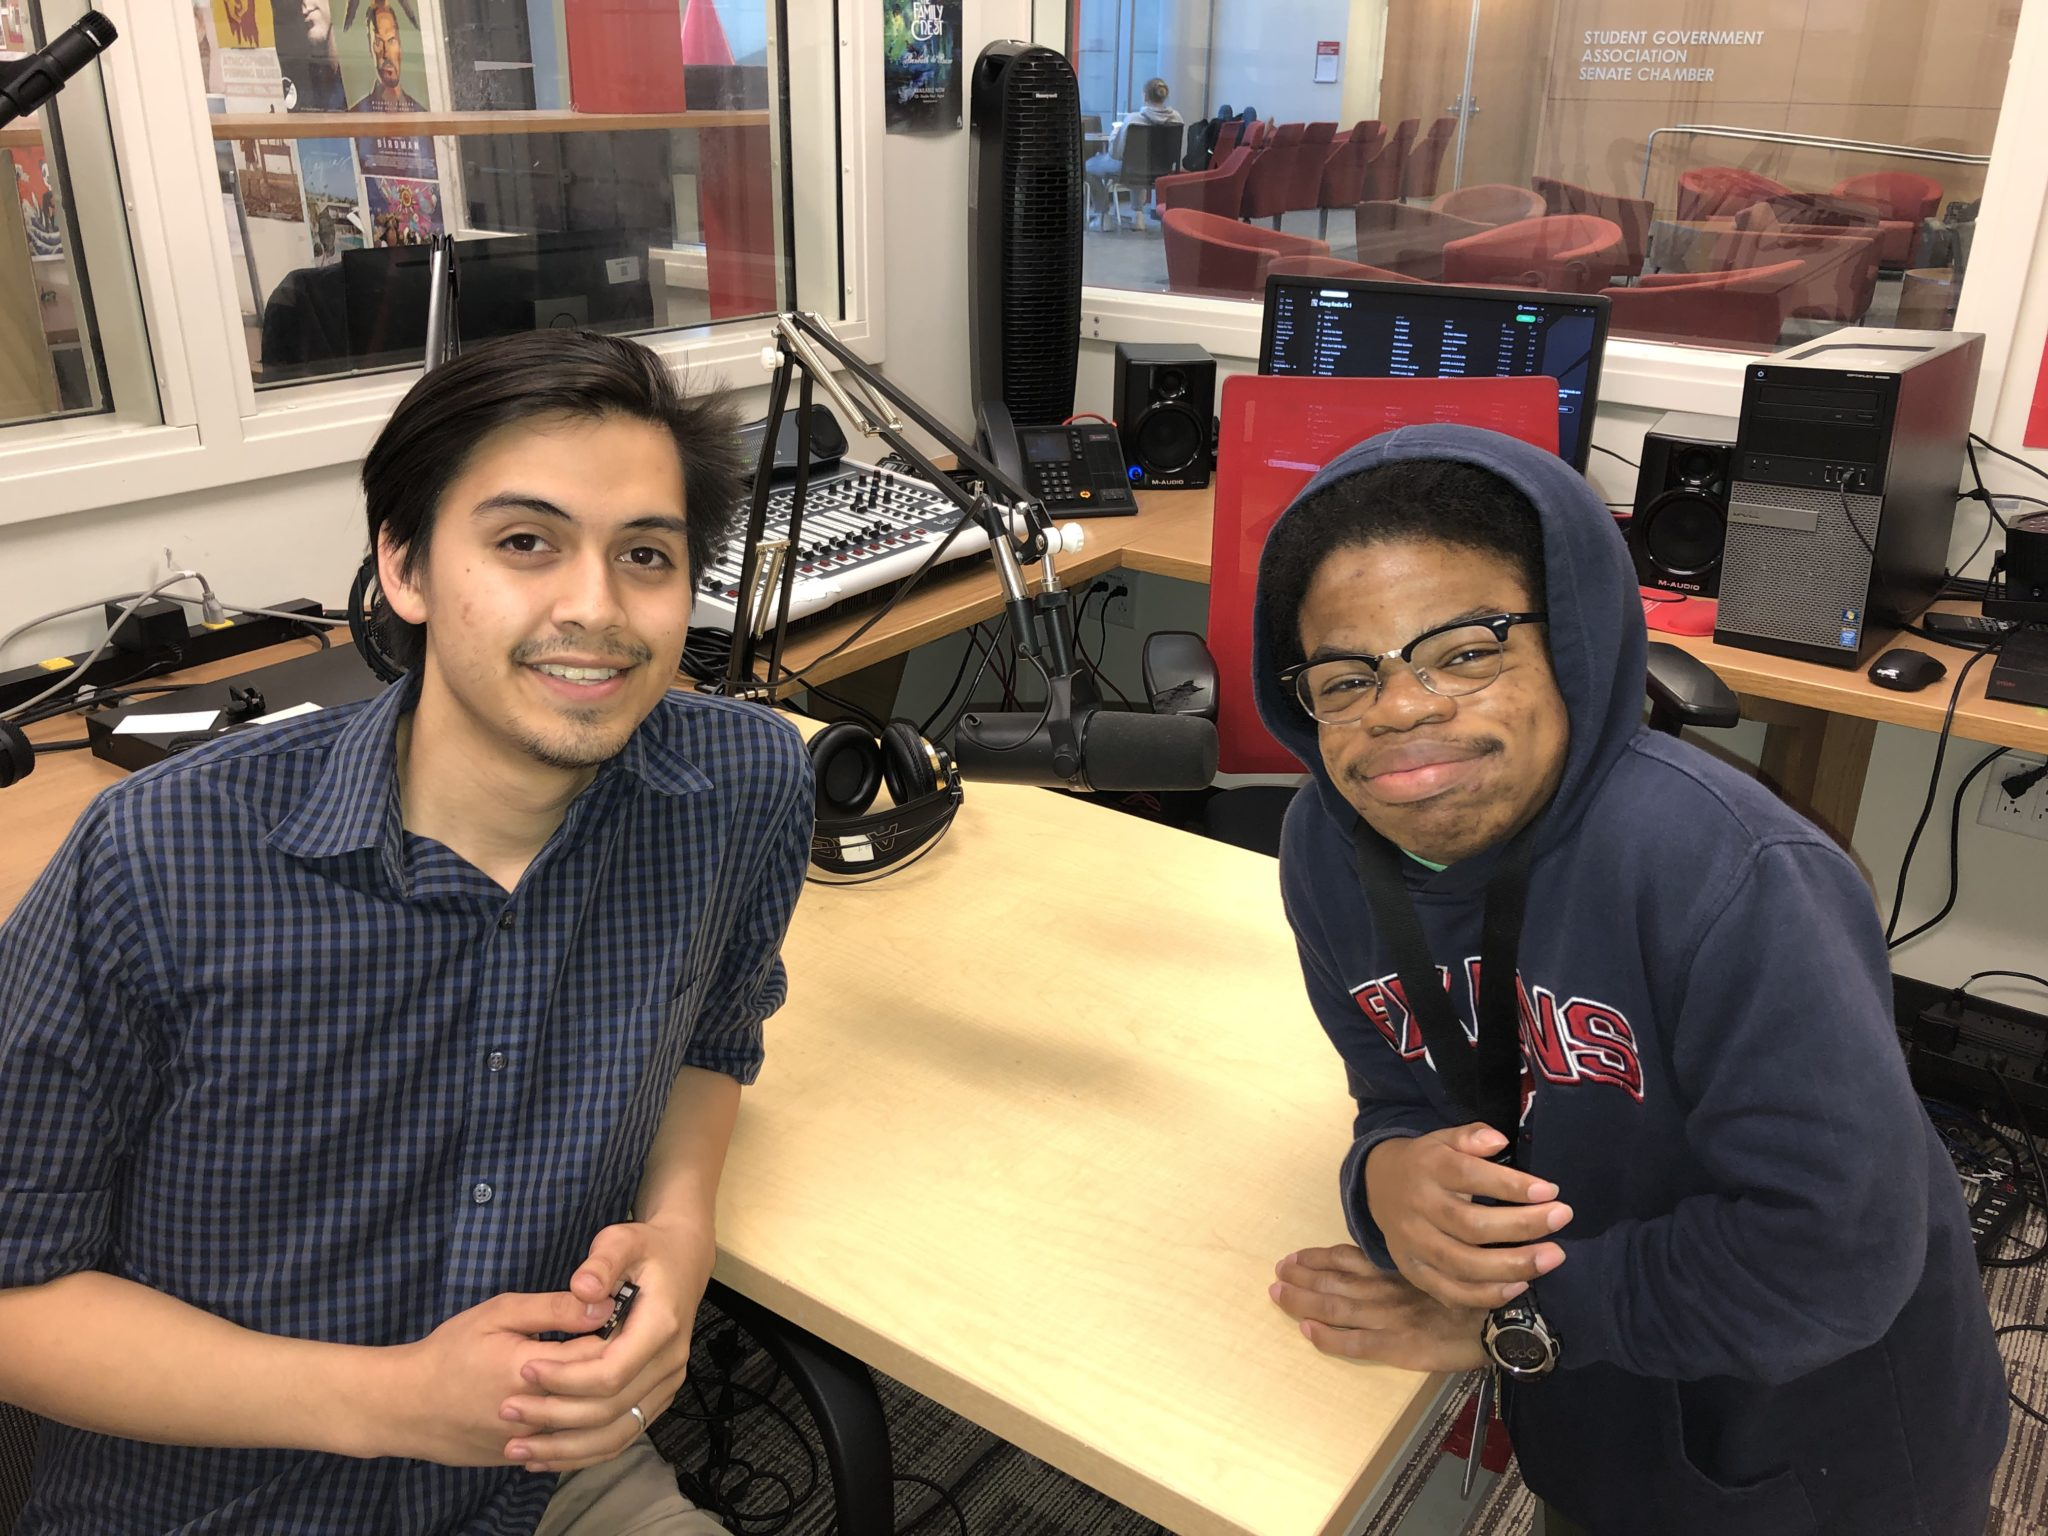 What's Good with DJ Waller – Interview with Davis Mendoza Darusman